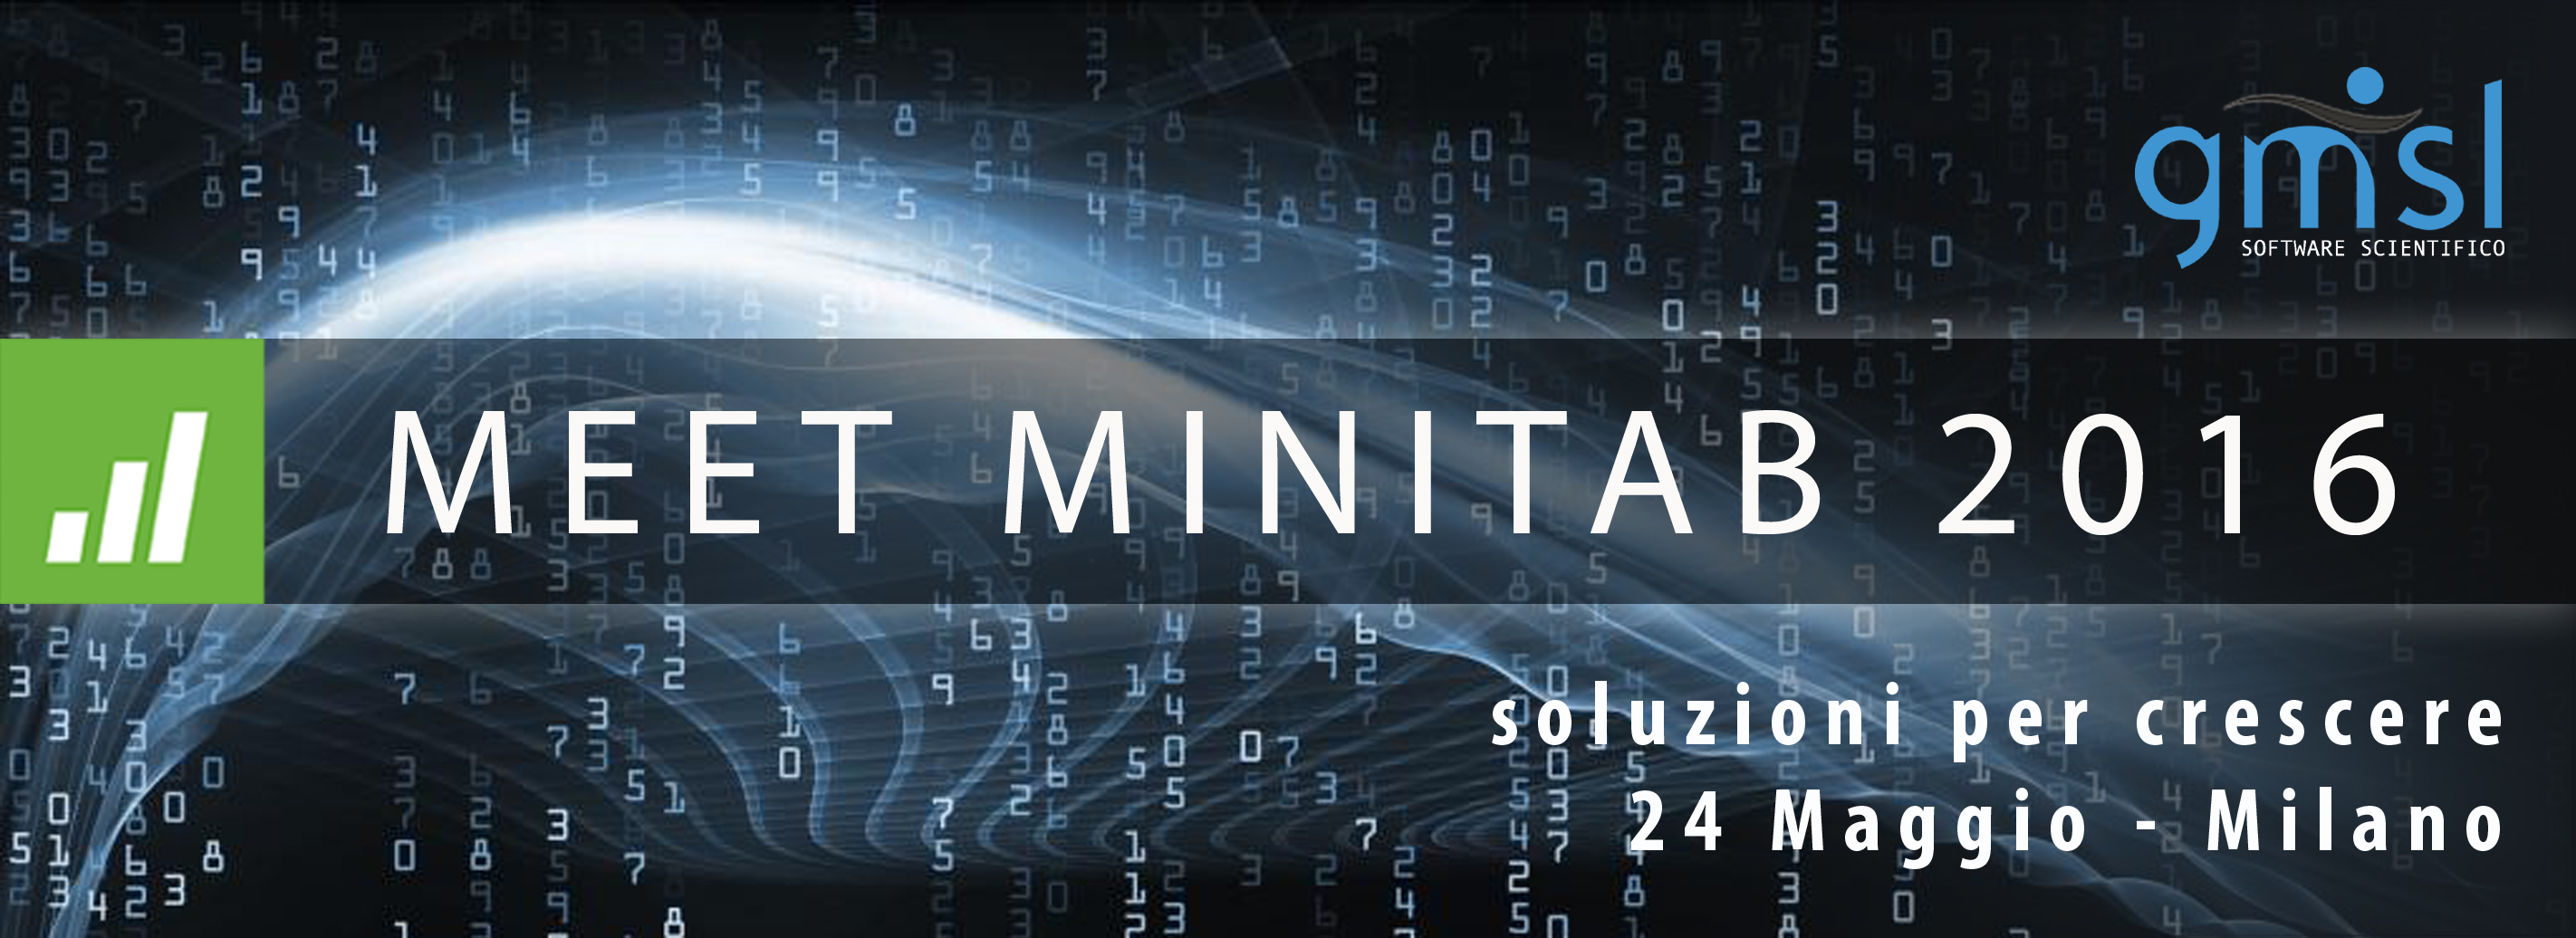 meet_minitab_2016-copia Meet Minitab. Milano, 24 Maggio